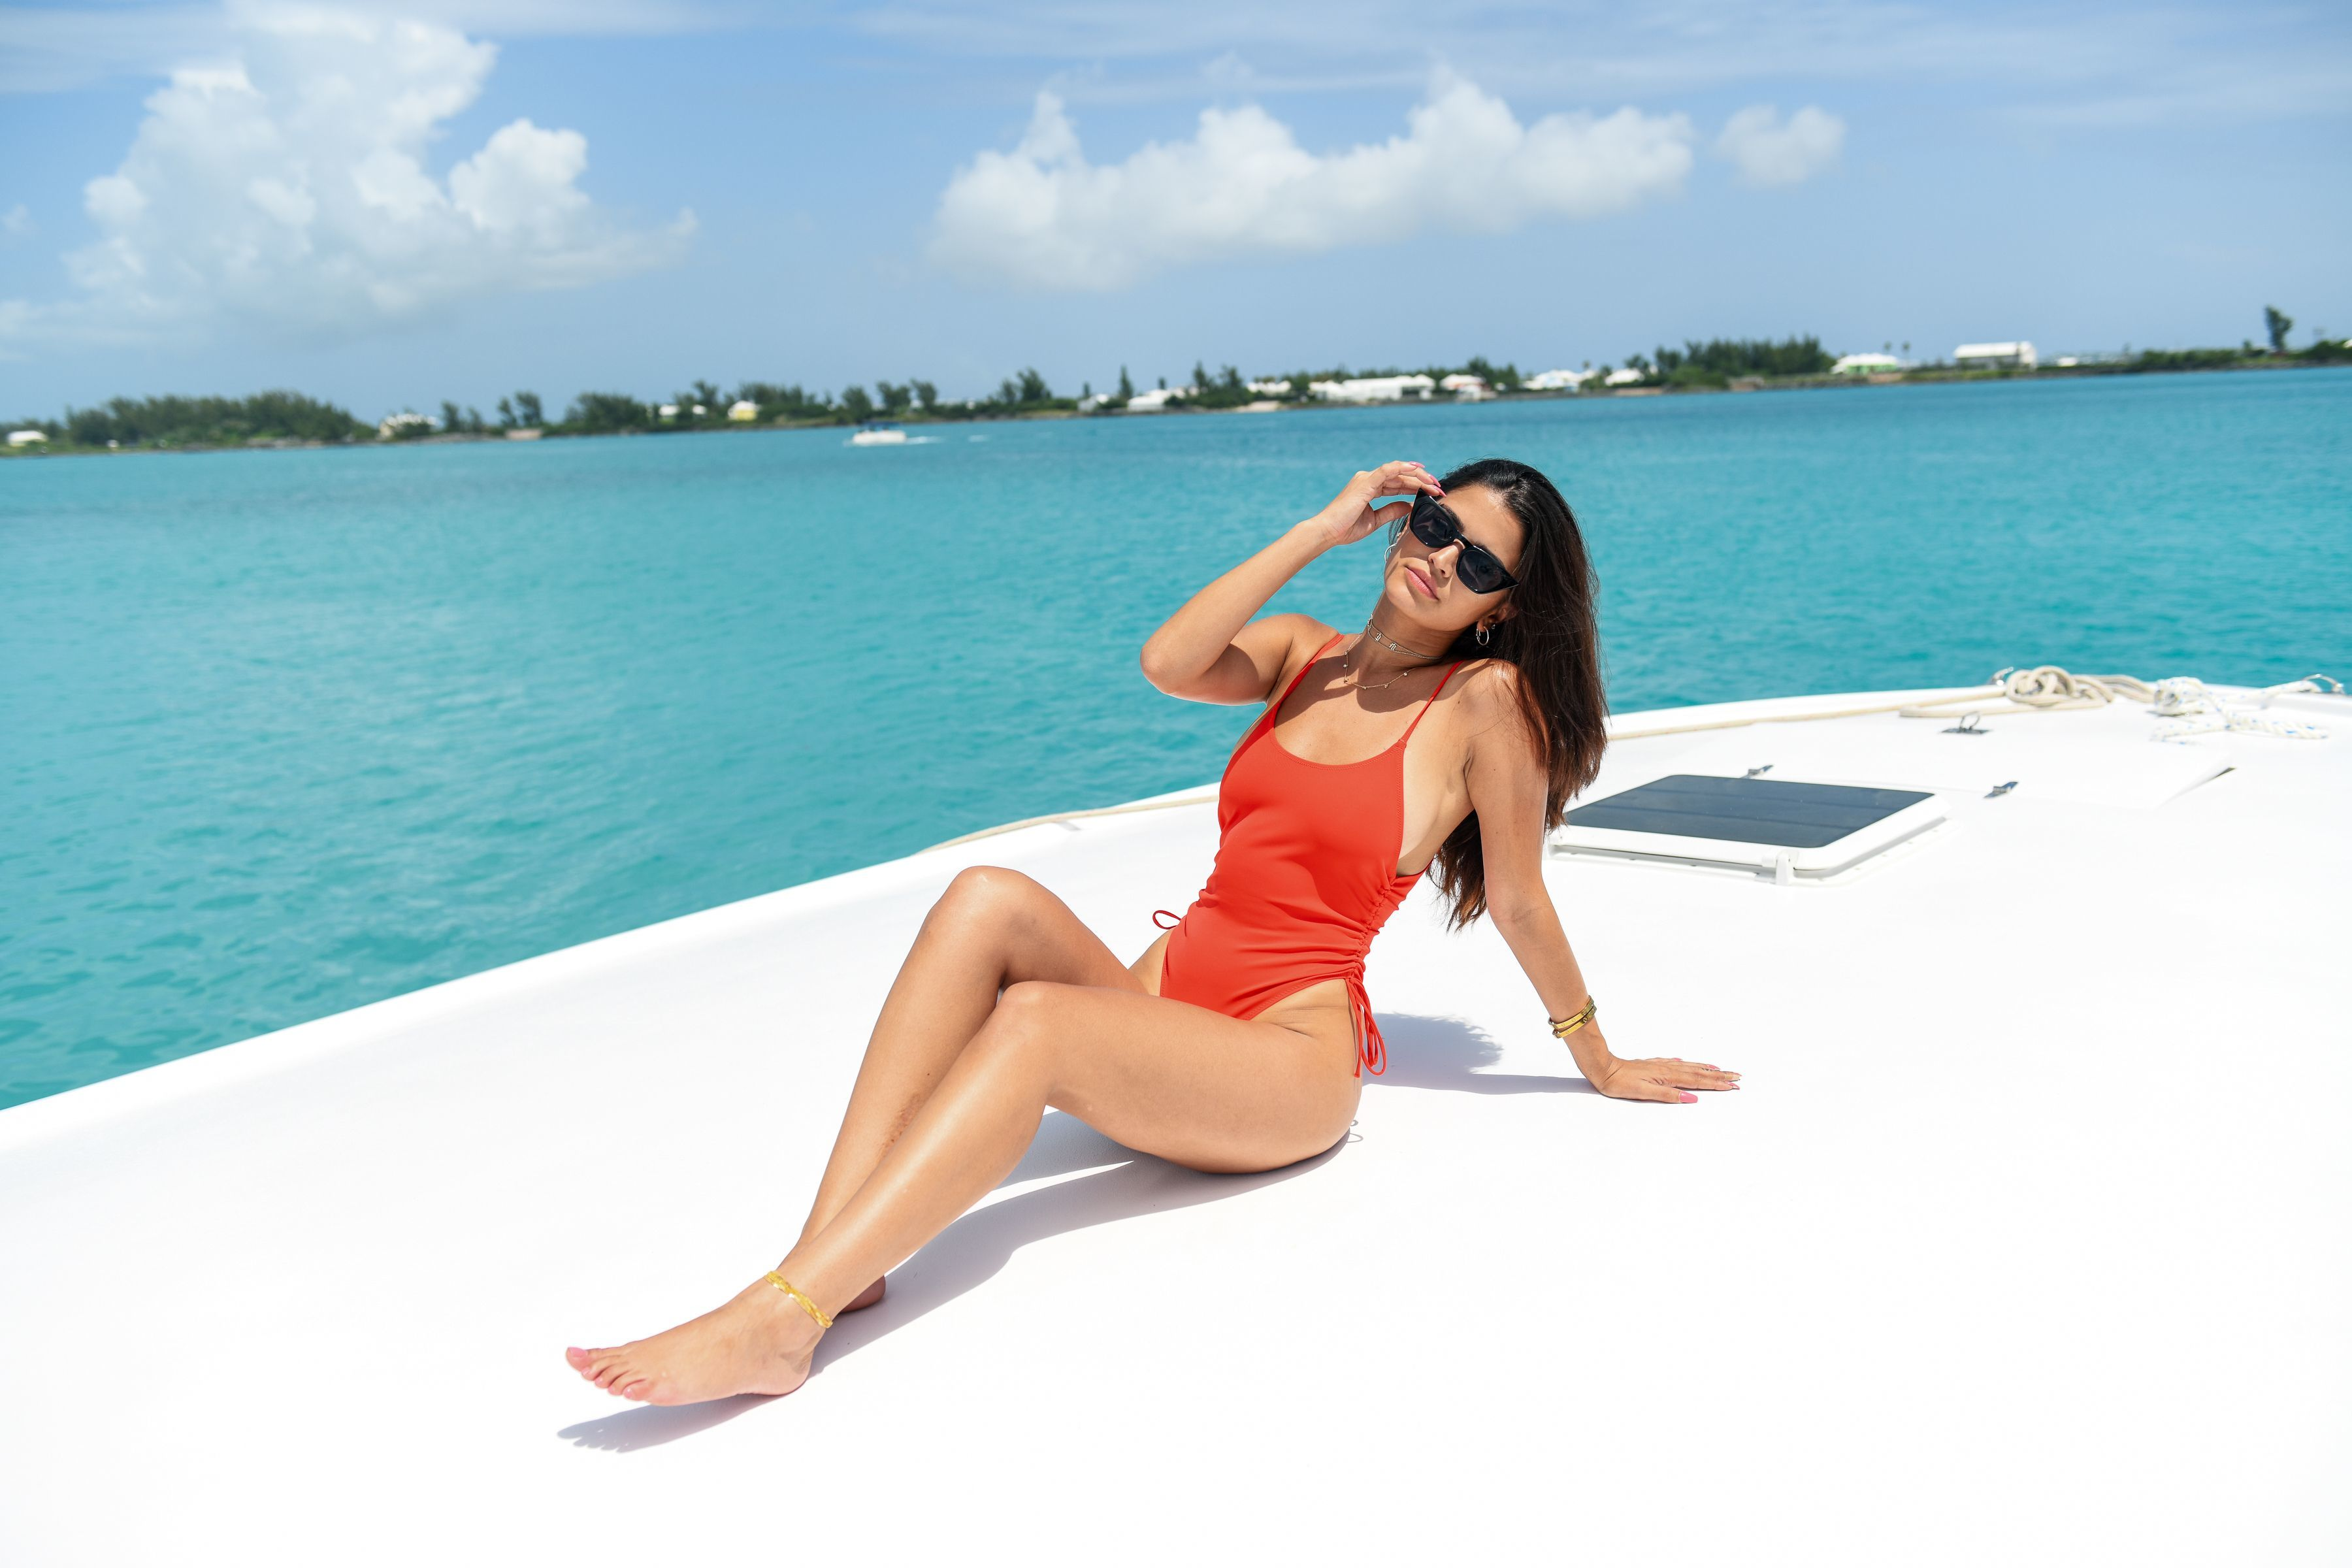 Feet Kailyn De Los Rios nudes (88 photo), Pussy, Paparazzi, Twitter, in bikini 2015